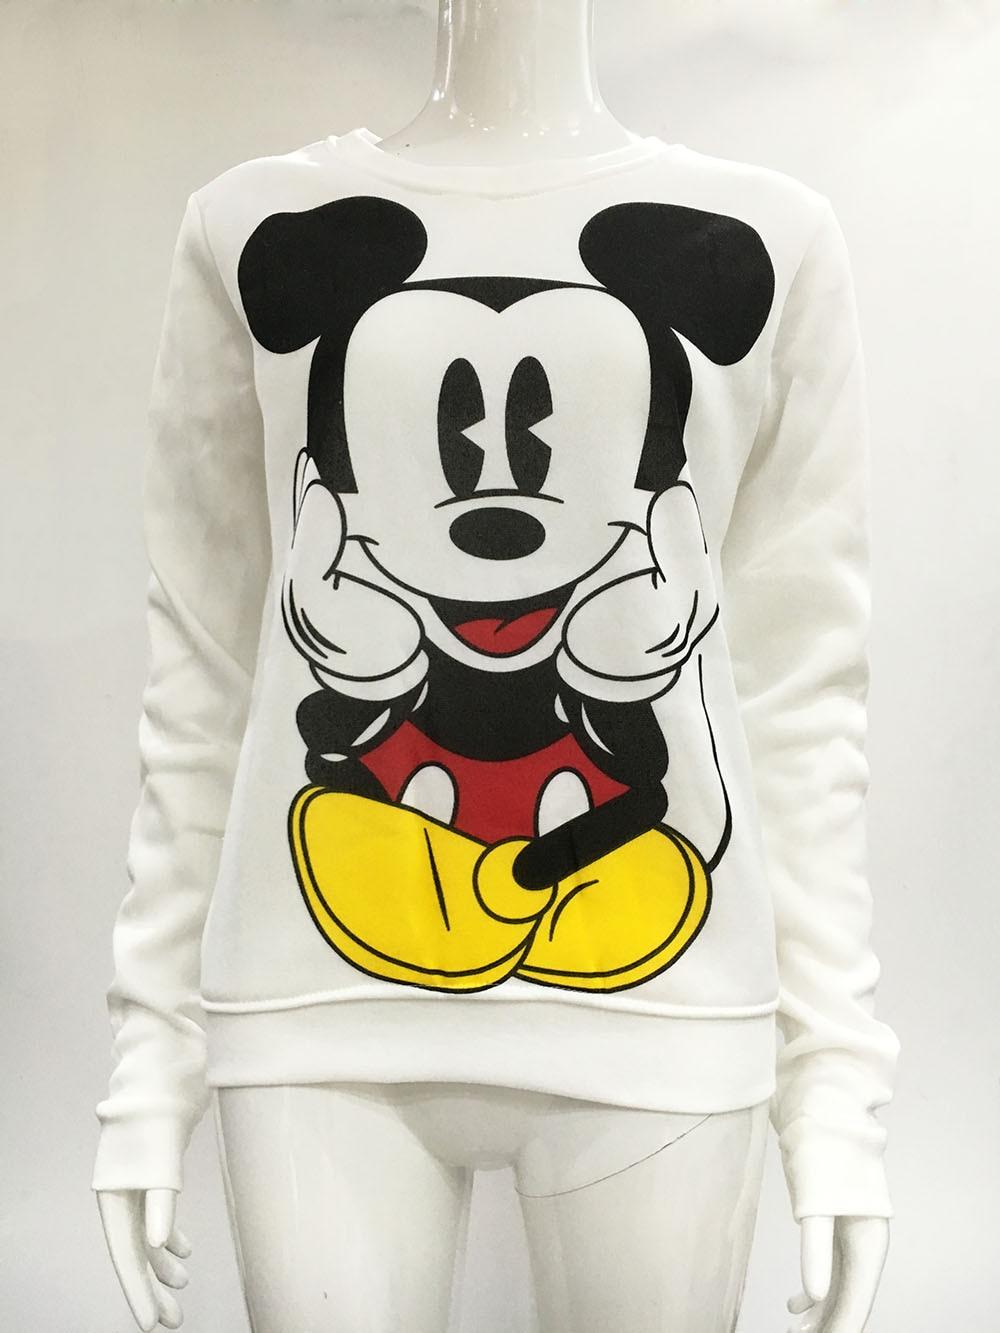 2016 Fashion Ny europæisk Mickey trykning Sweatshirt Hoodies - Dametøj - Foto 6